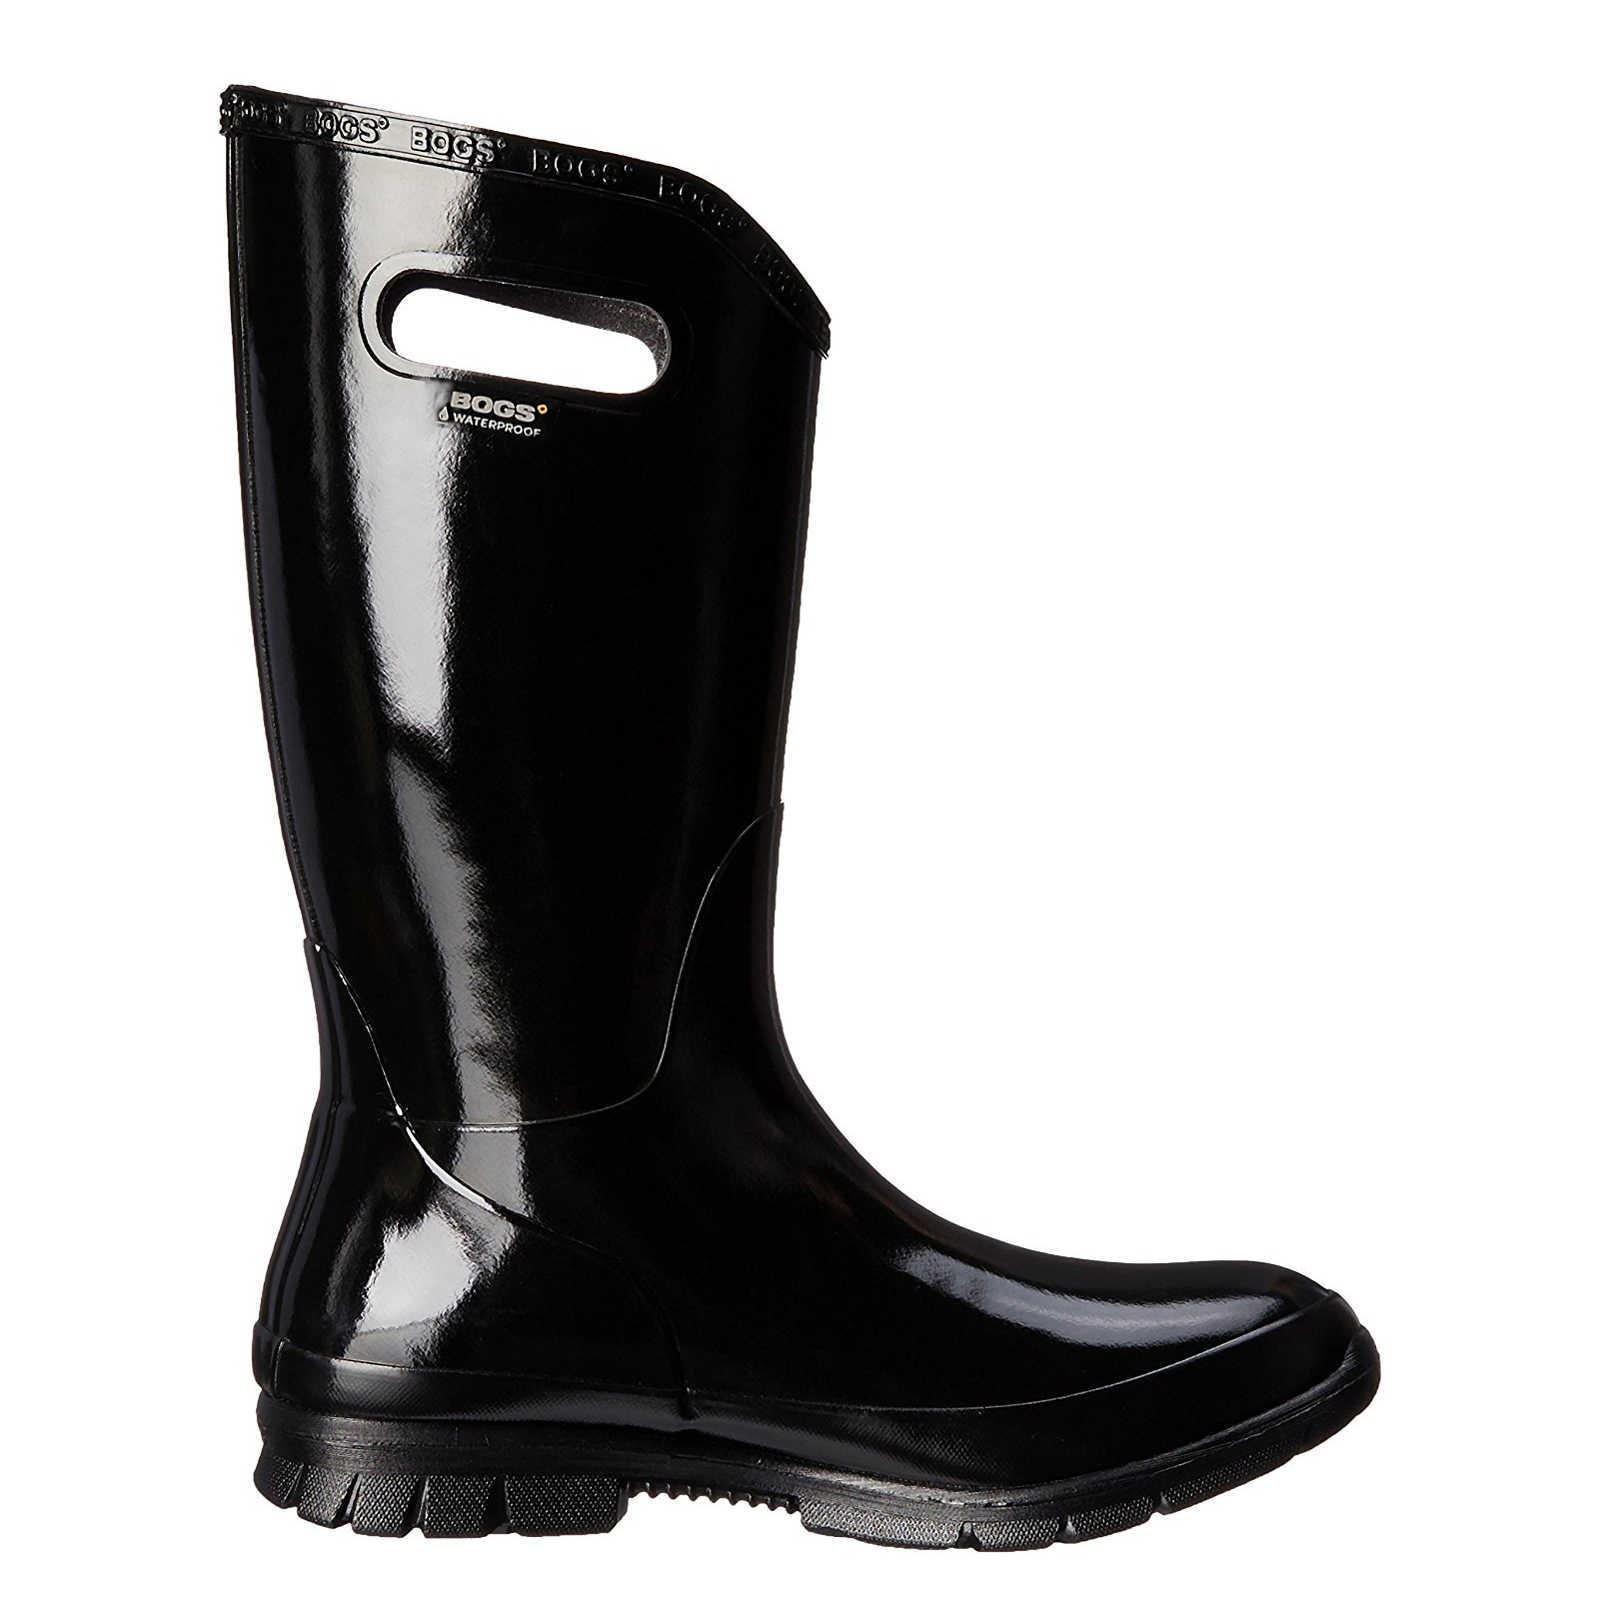 Bogs Women's Berkley Rain Boot, Black, 10 M US